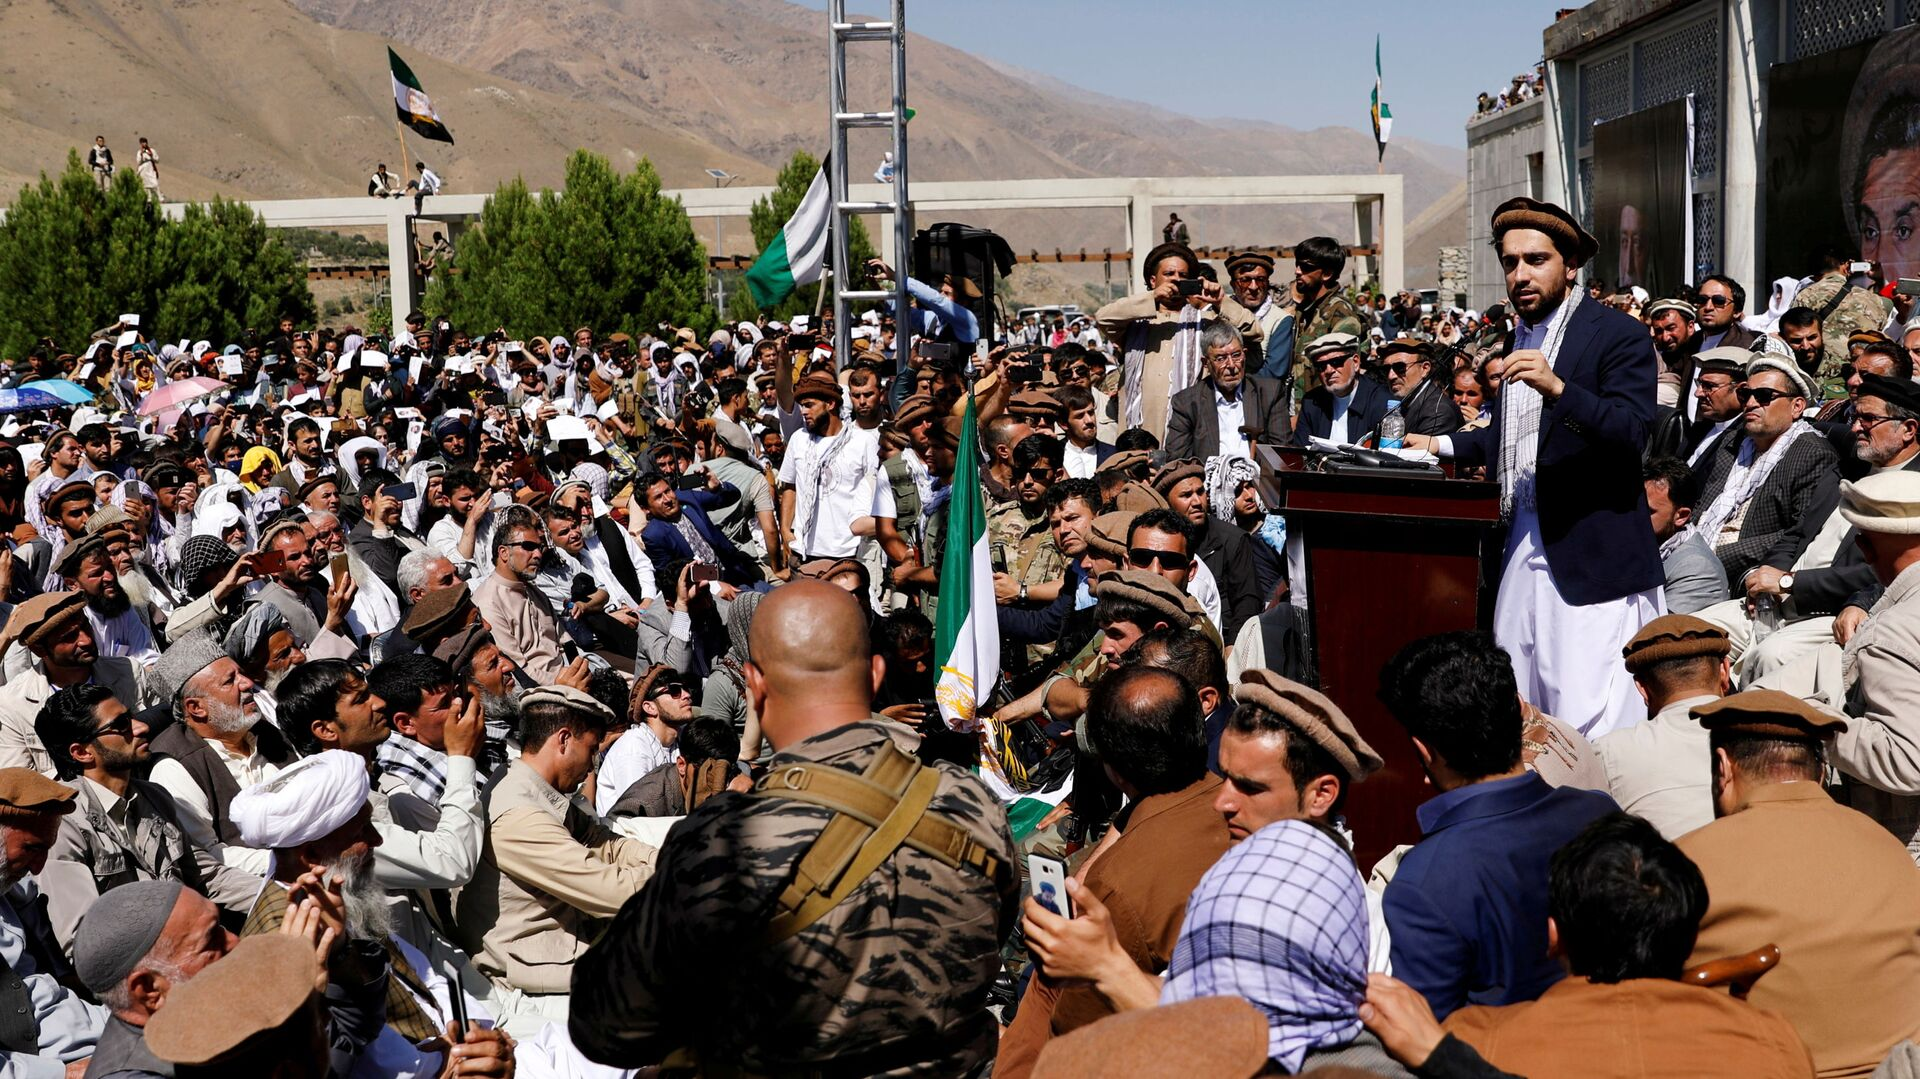 Ahmad Massoud, son of the slain hero of the anti-Soviet resistance Ahmad Shah Massoud, speaks to his supporters in Bazarak, Panjshir province Afghanistan September 5, 2019. Picture taken September 5, 2019. - Sputnik International, 1920, 15.09.2021